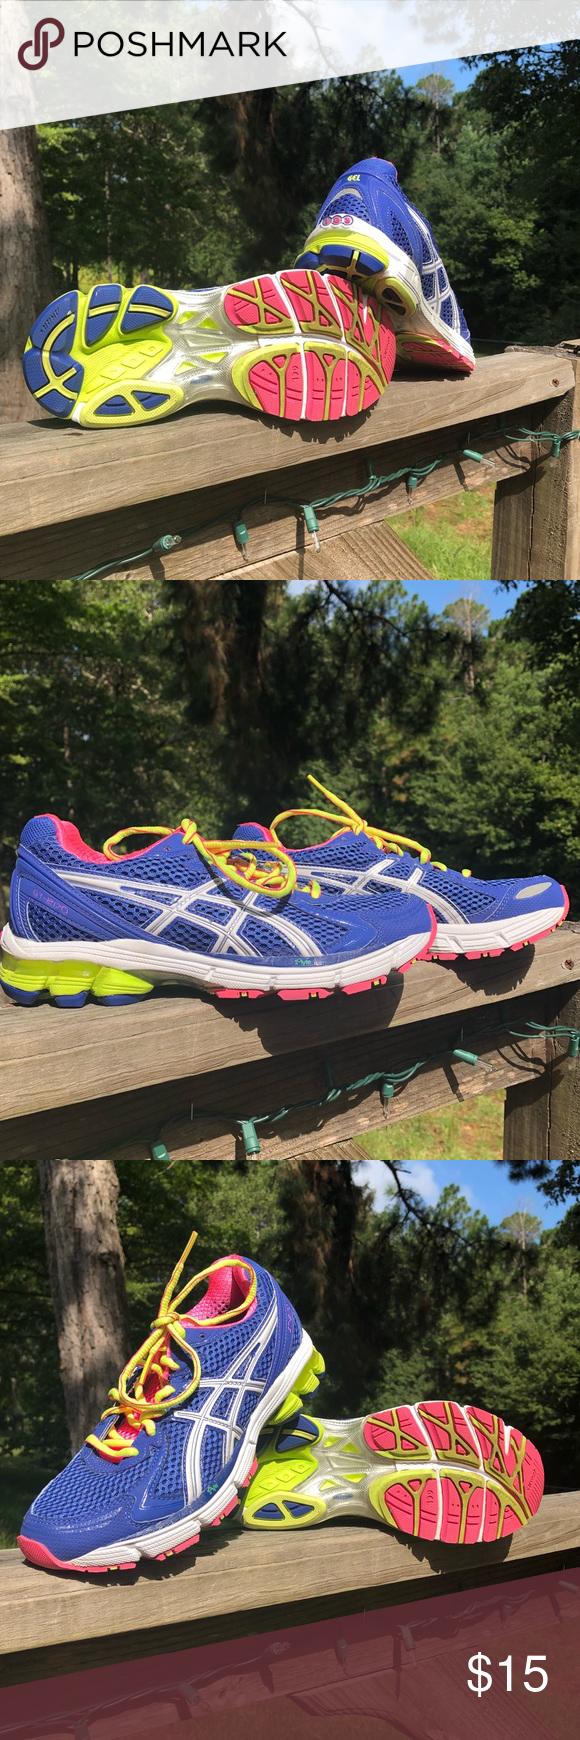 0eb2219ff33 ASICS Sneakers Purple/pink/yellow duomax gel asics size 6 good ...